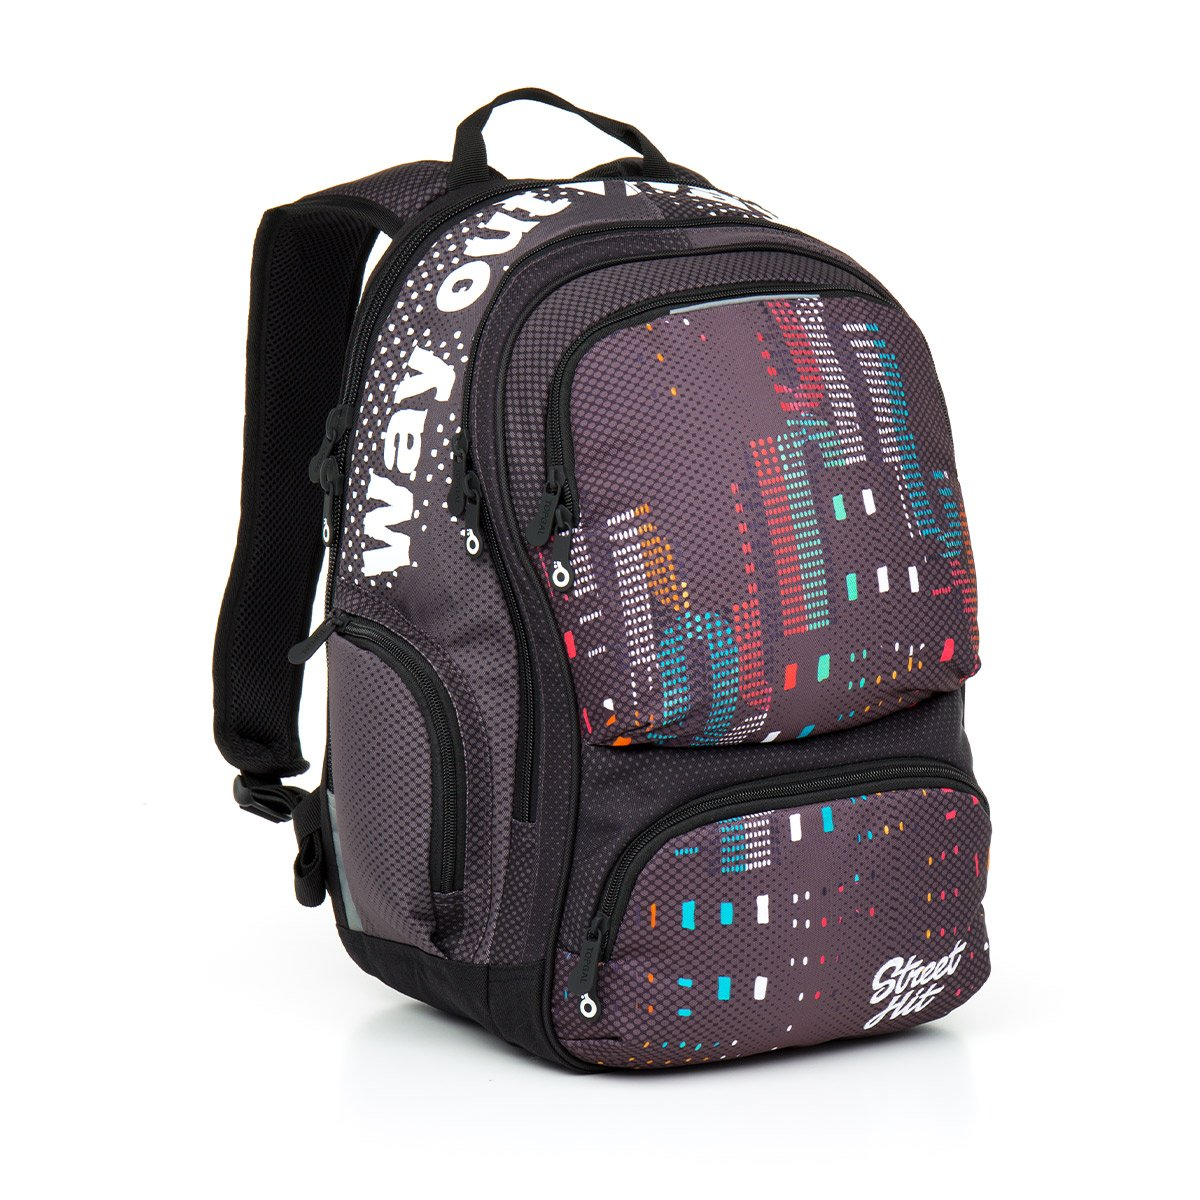 Studentský batoh Topgal HIT 865 C - Grey  1242f70af6